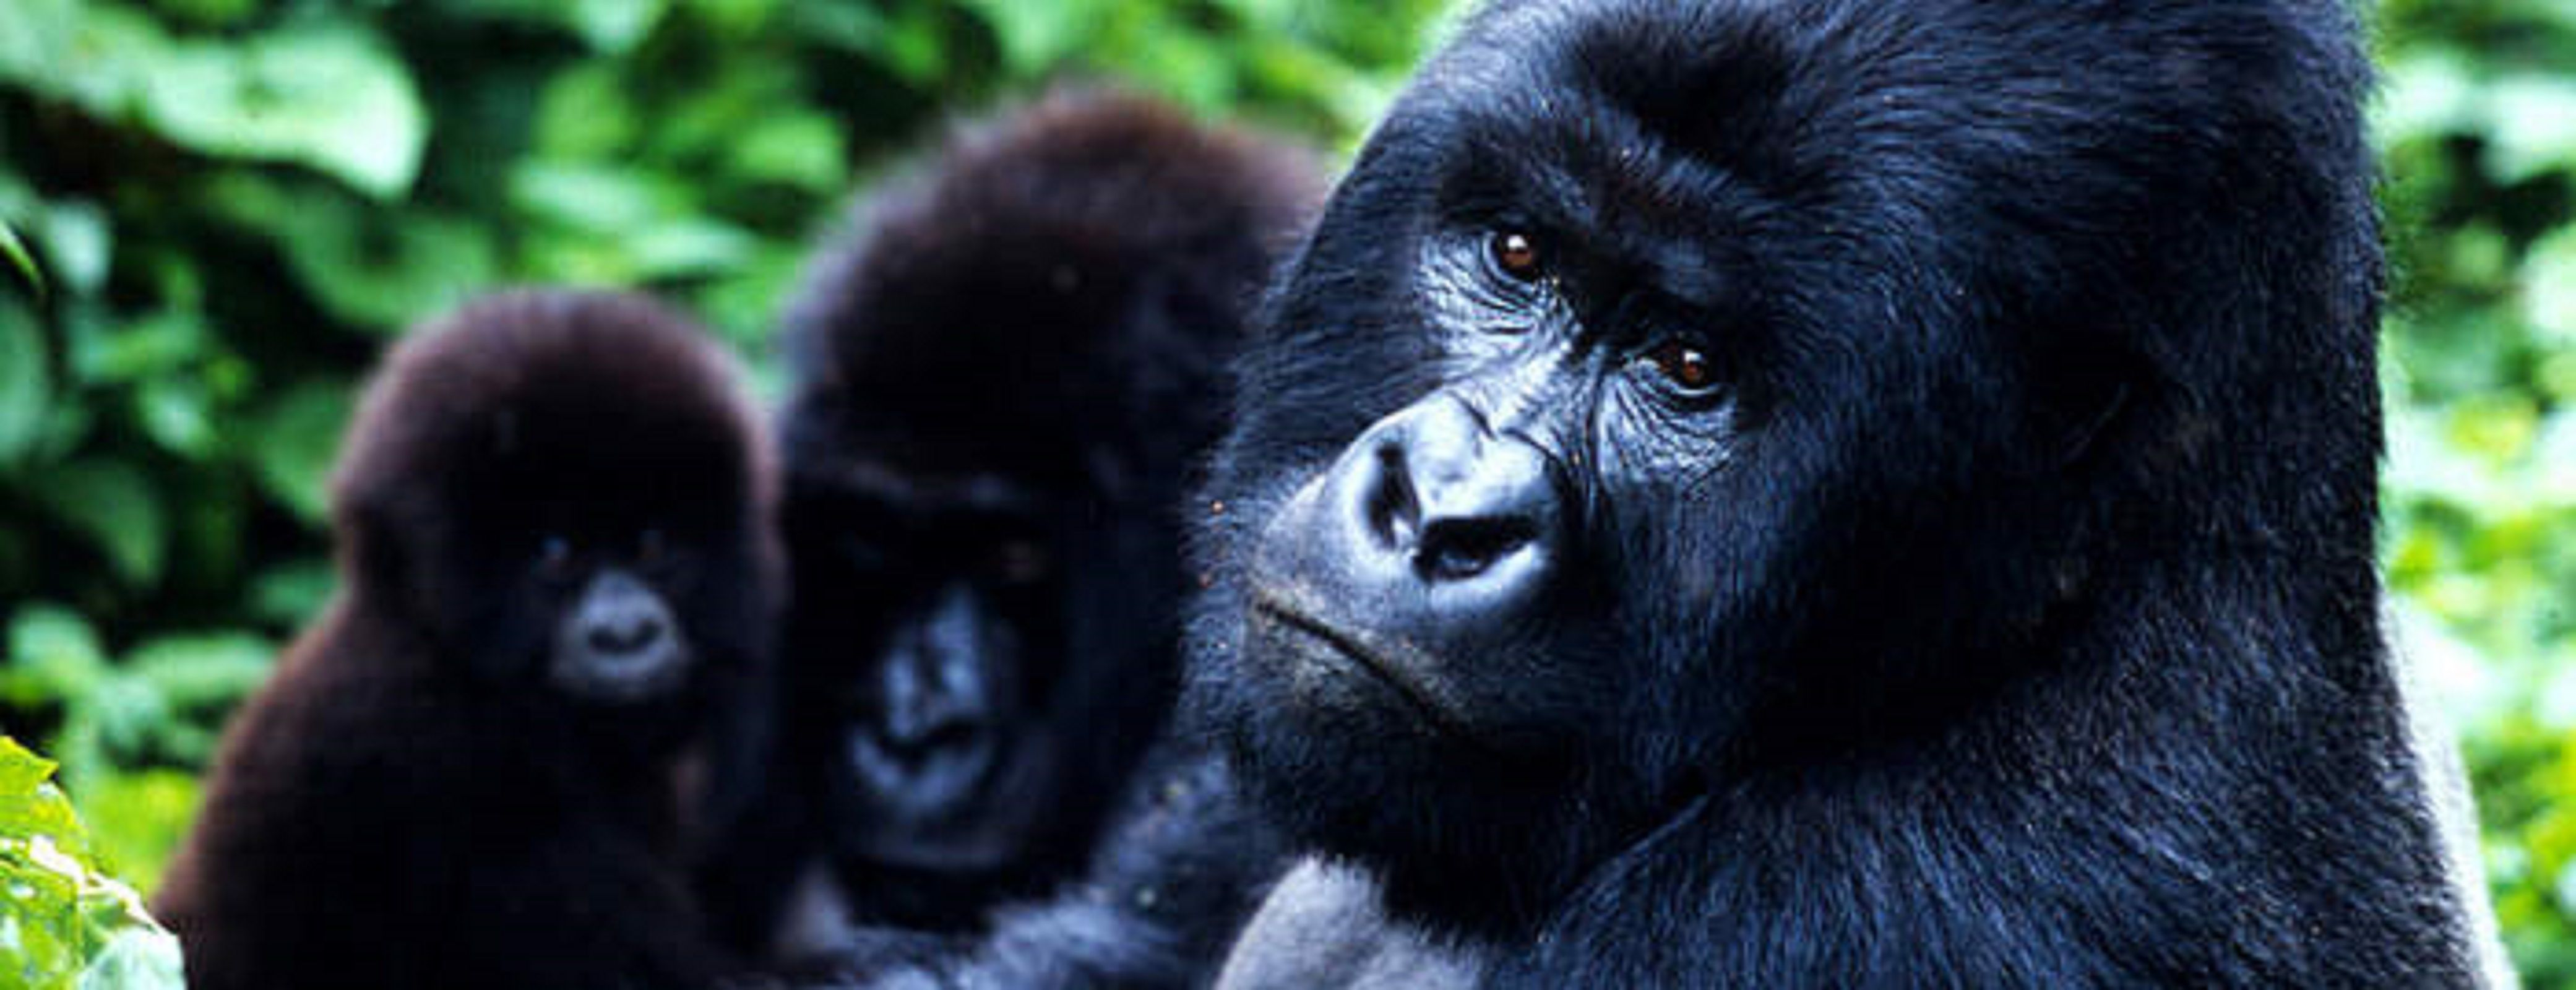 African mountain animals - Uganda Safaris Tours For African Wildlife Safaris Gorilla Trekking Cultural Safaris Visit Uganda